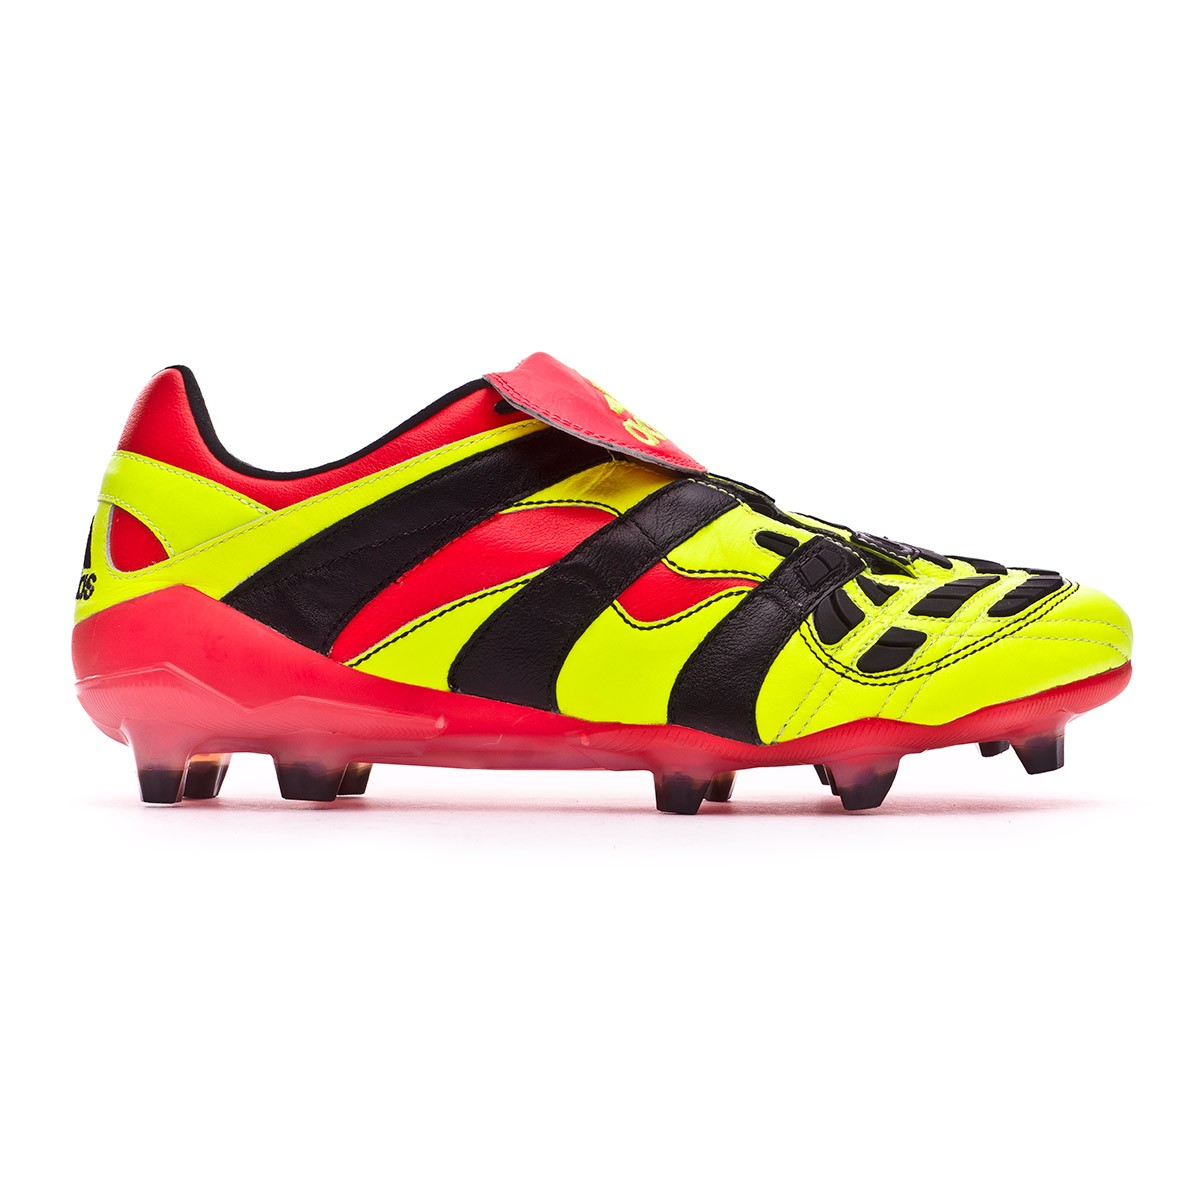 new style a8205 ef75a Zapatos de fútbol adidas Predator Accelerator FG Solar yellow - Tienda de  fútbol Fútbol Emotion